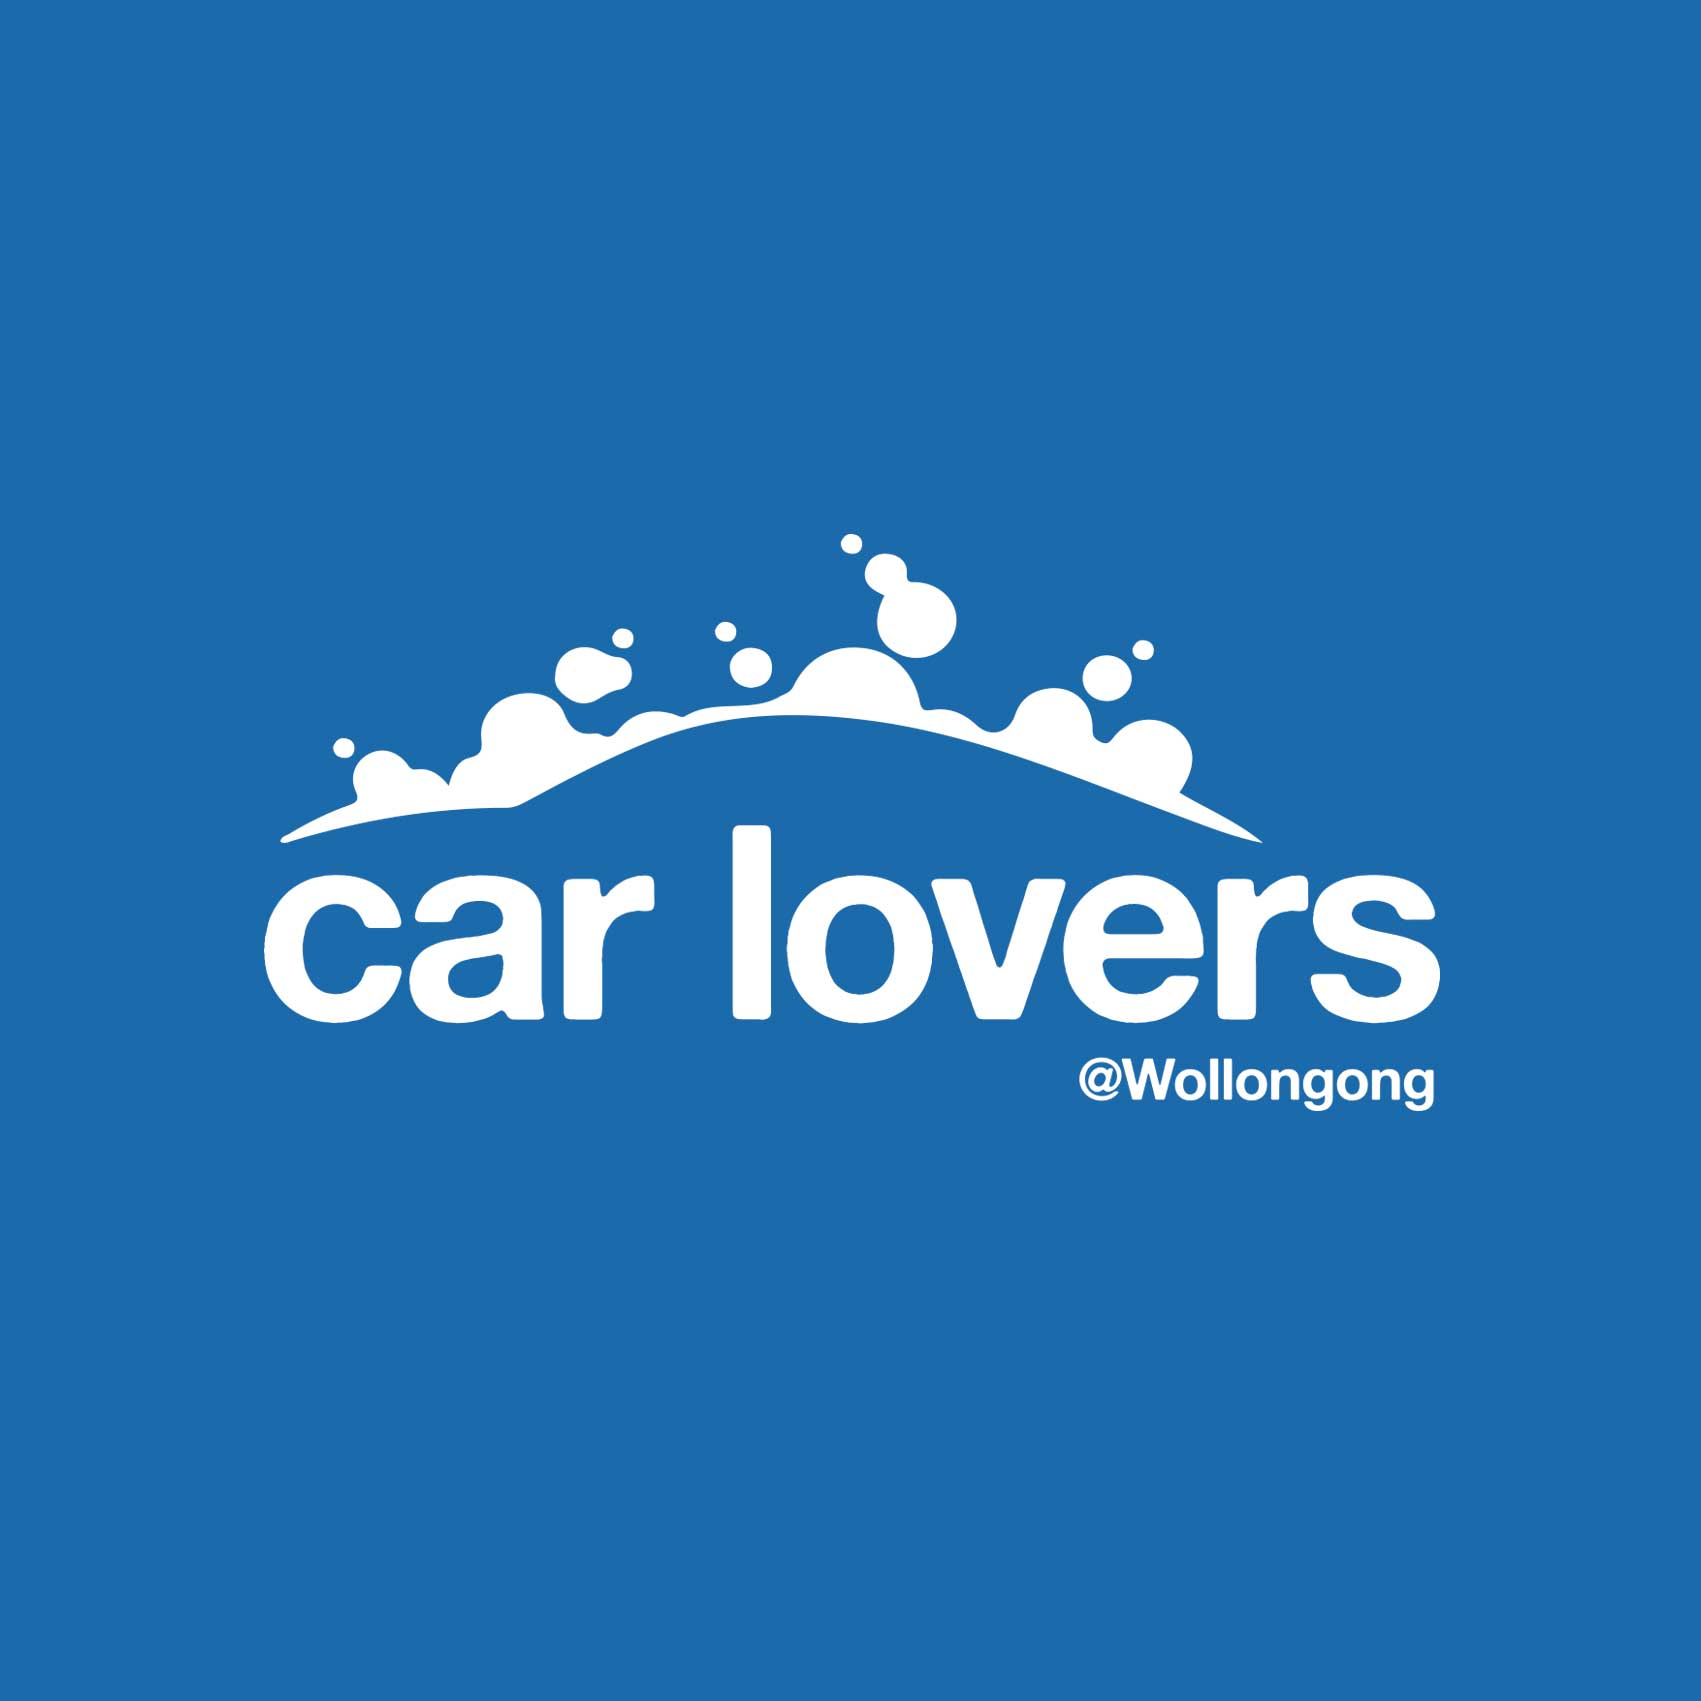 car-lovers-car-wash-graphic-design-logo-wollongong-visual-energy-signs-illawarra.jpg